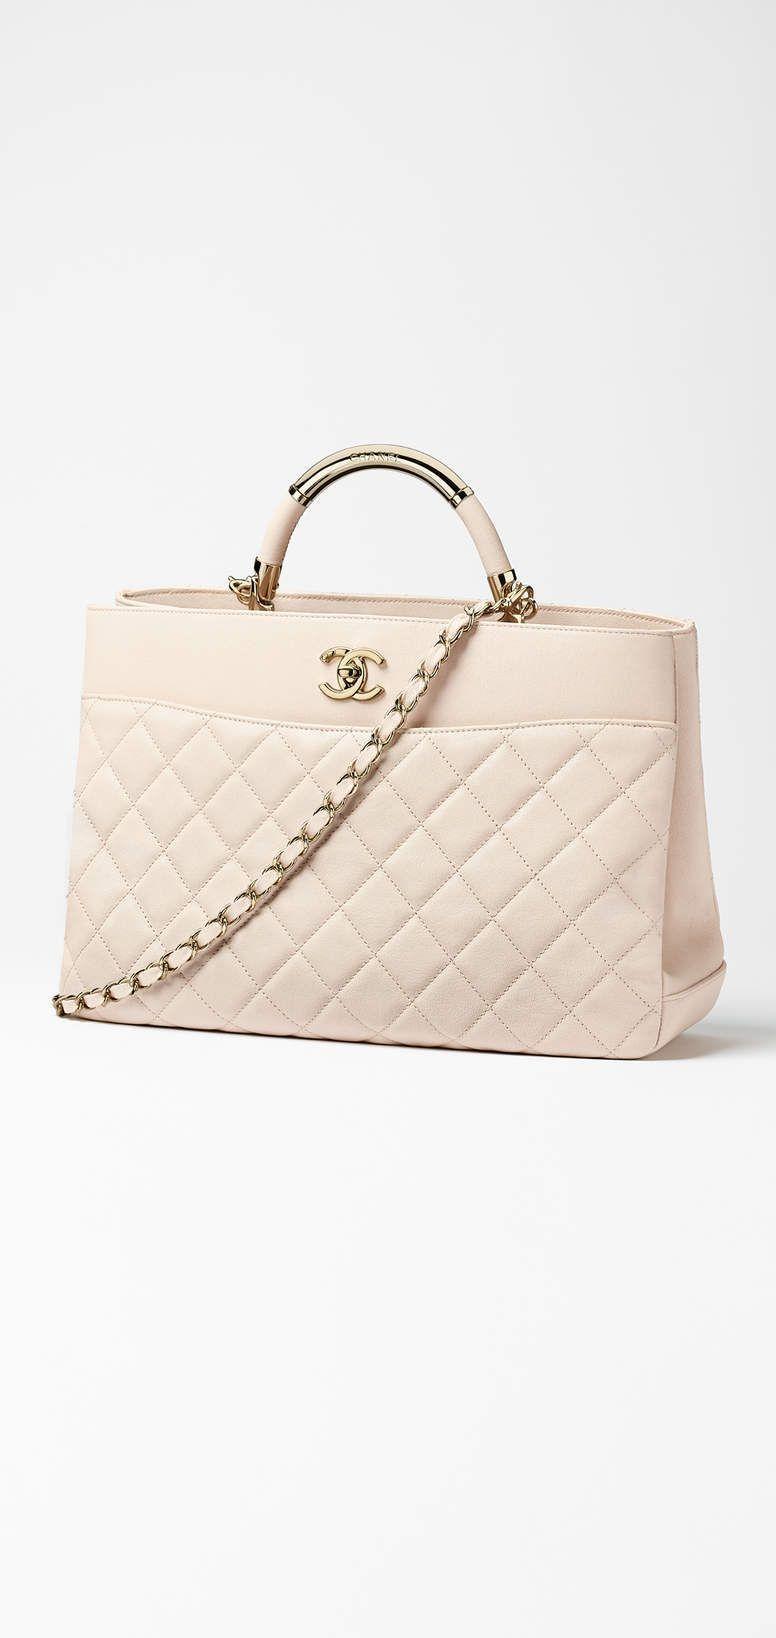 d89a54143e018 The latest  handbags collections on the CHANEL official website   designerhandbags